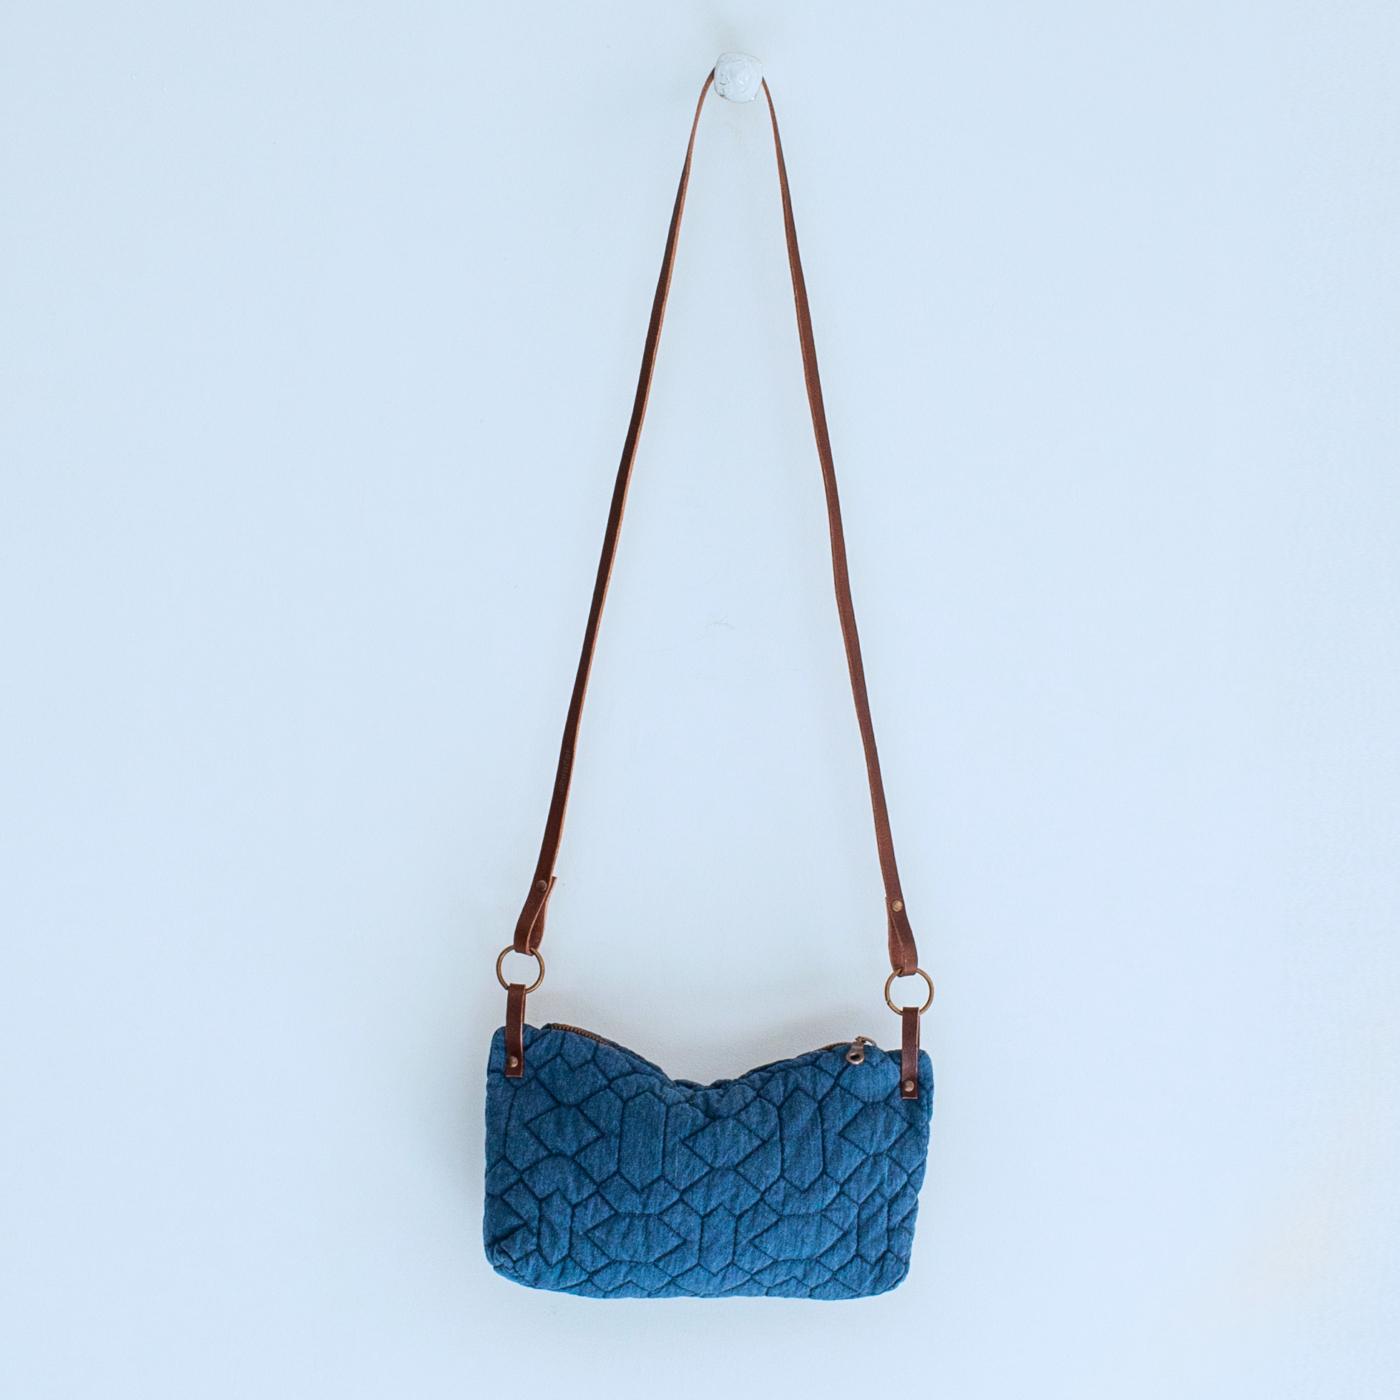 Bolso acolchado tira cuero, color azul petróleo Skandal